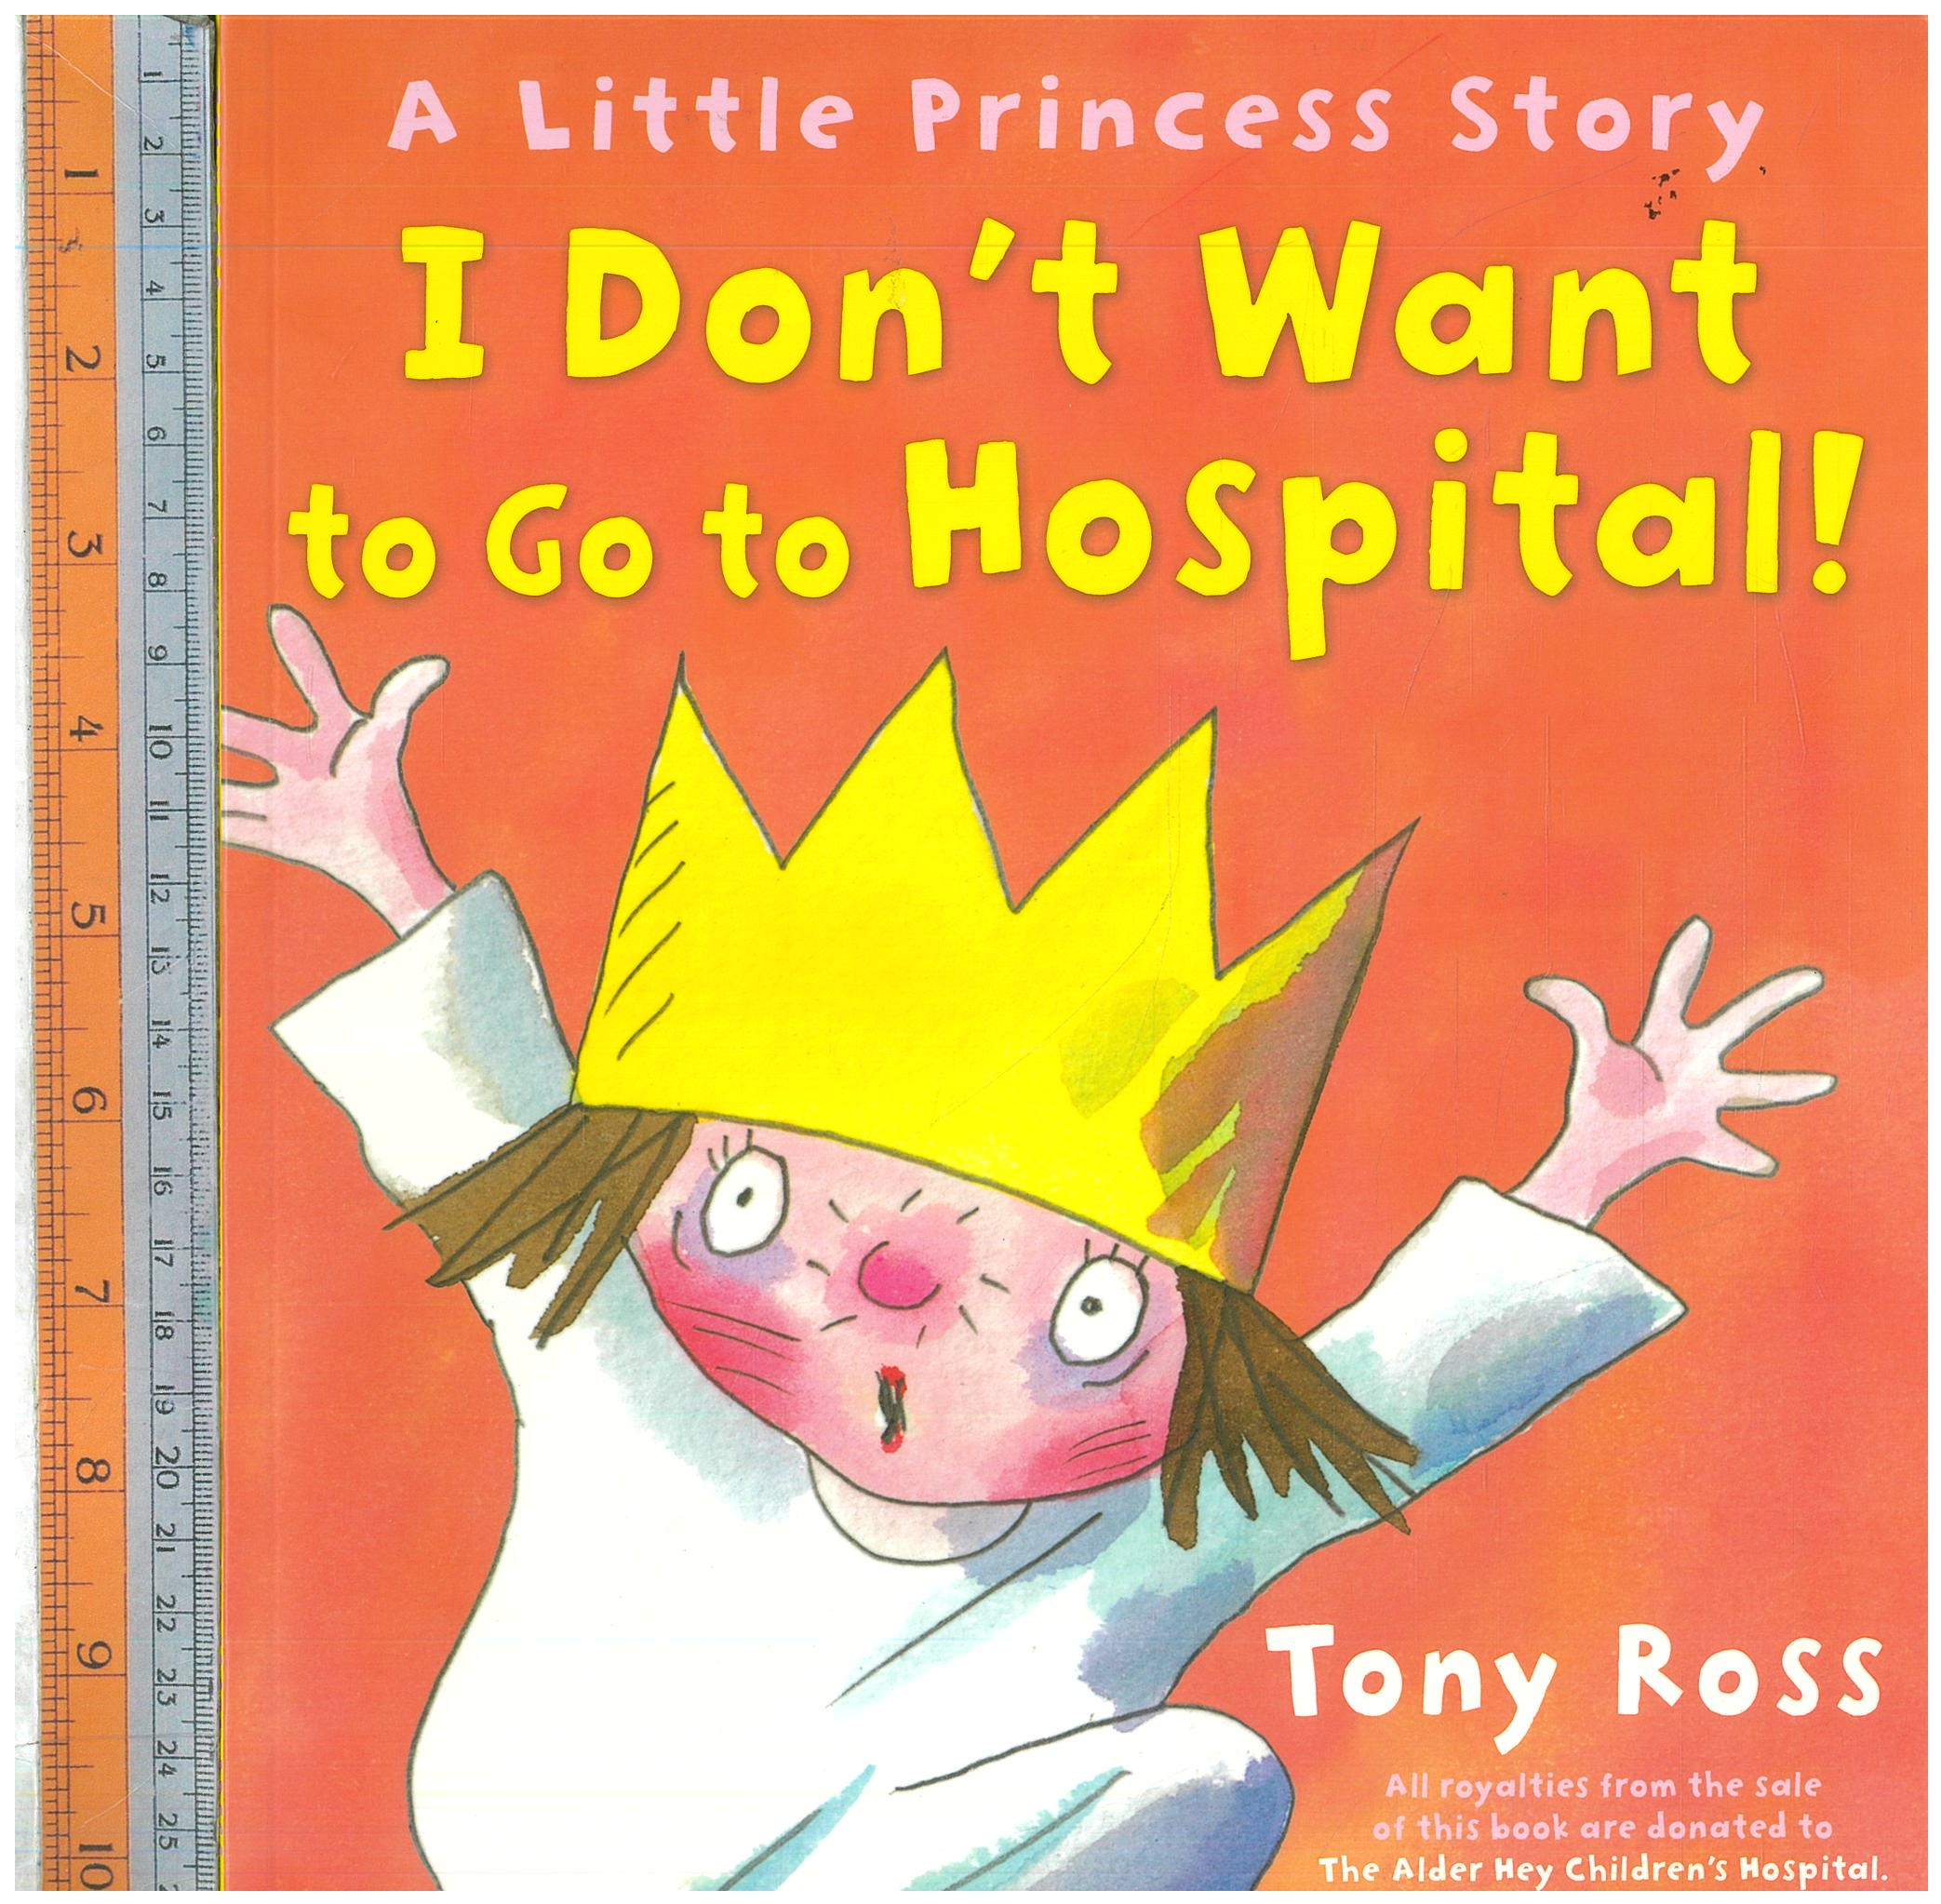 I don't want go to hospital